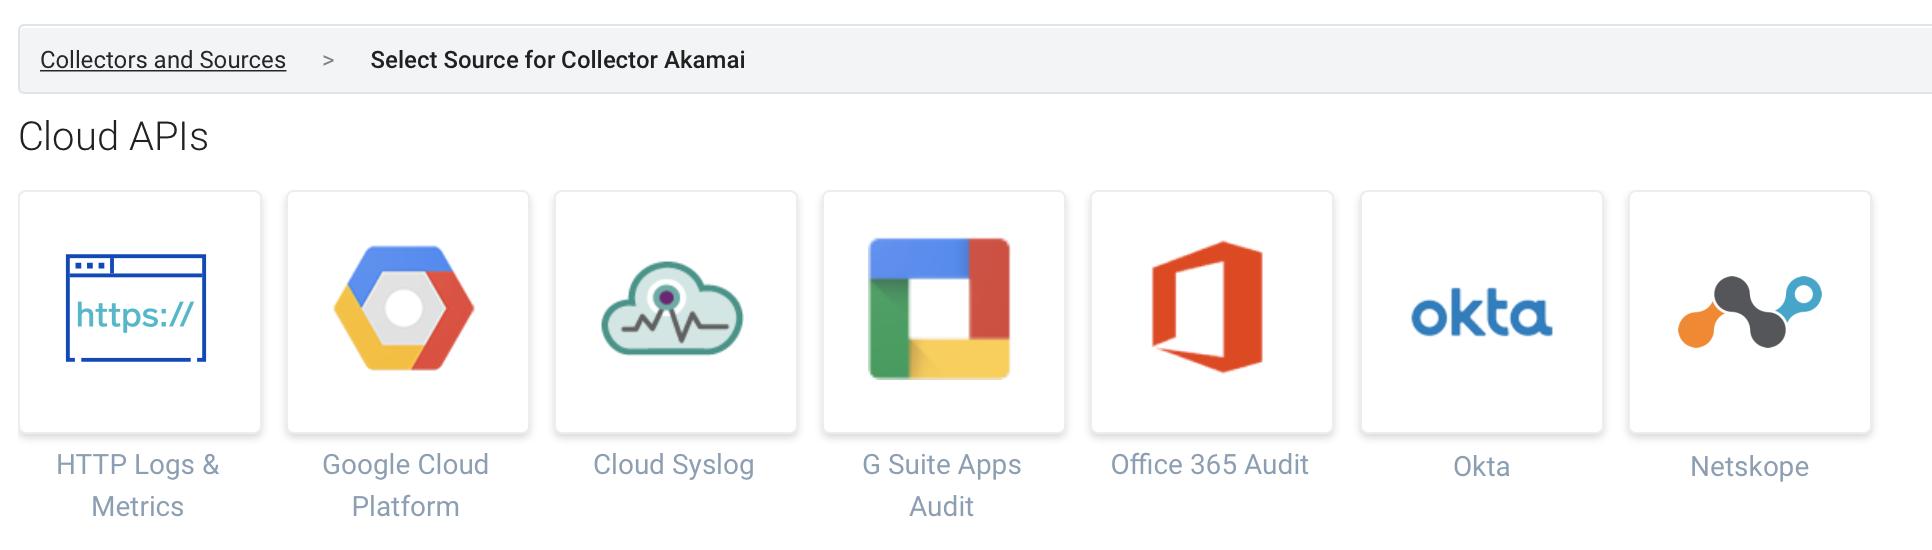 Cloud-to-Cloud Integration Framework